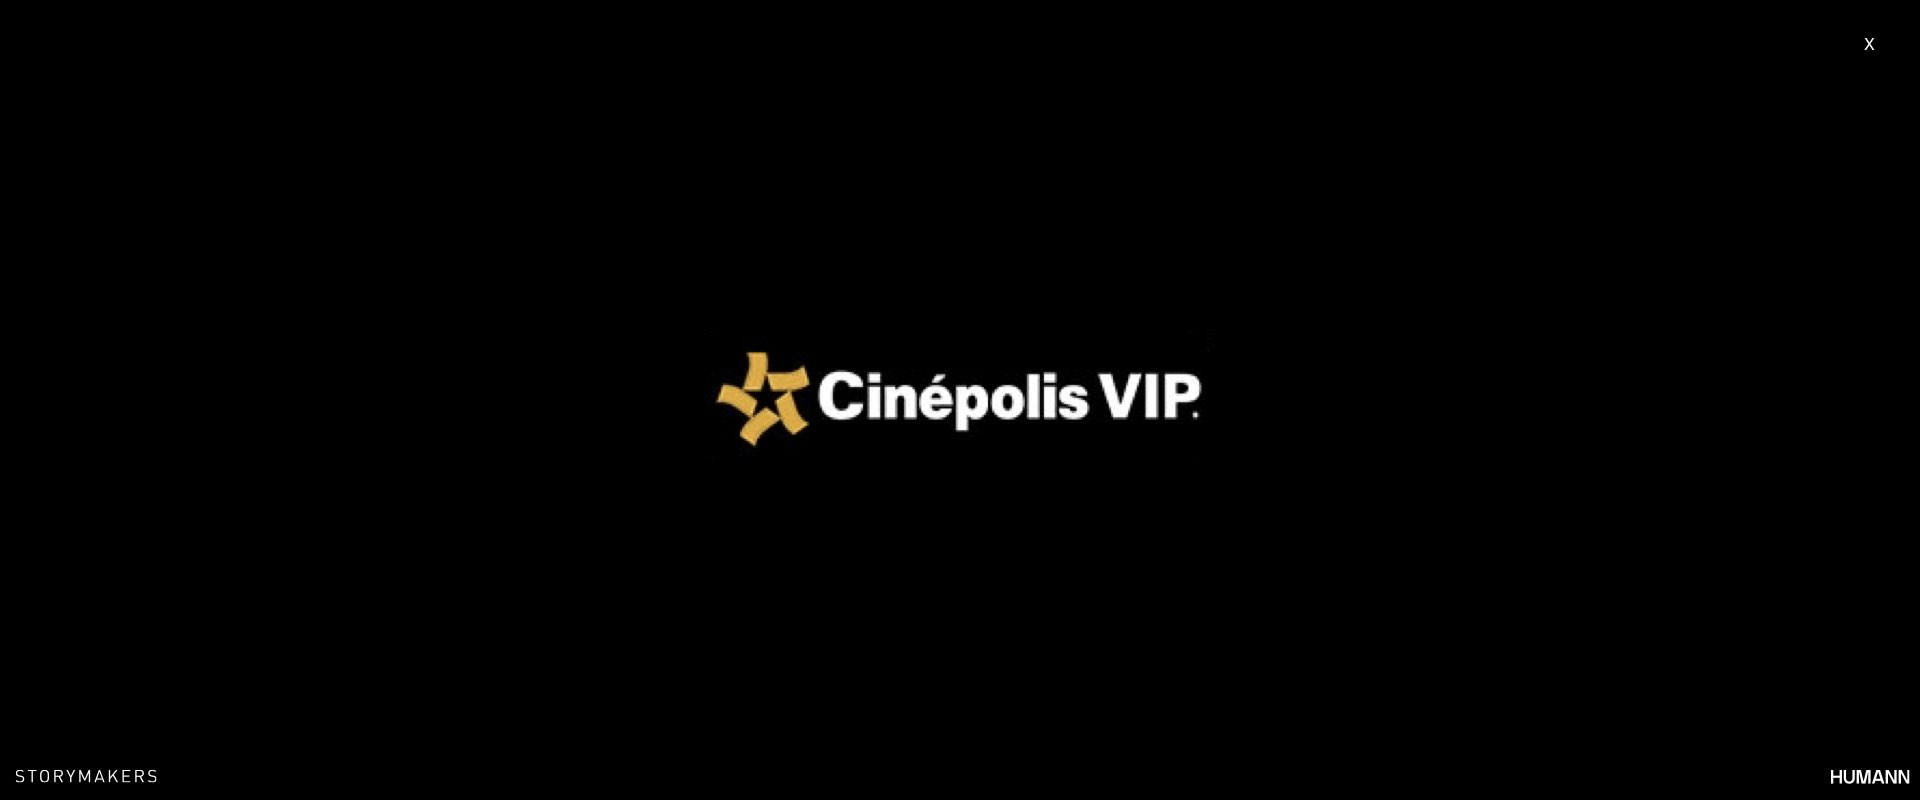 Humann :: Cinepolis Distribución :: Las Niñas Bien.003.jpeg